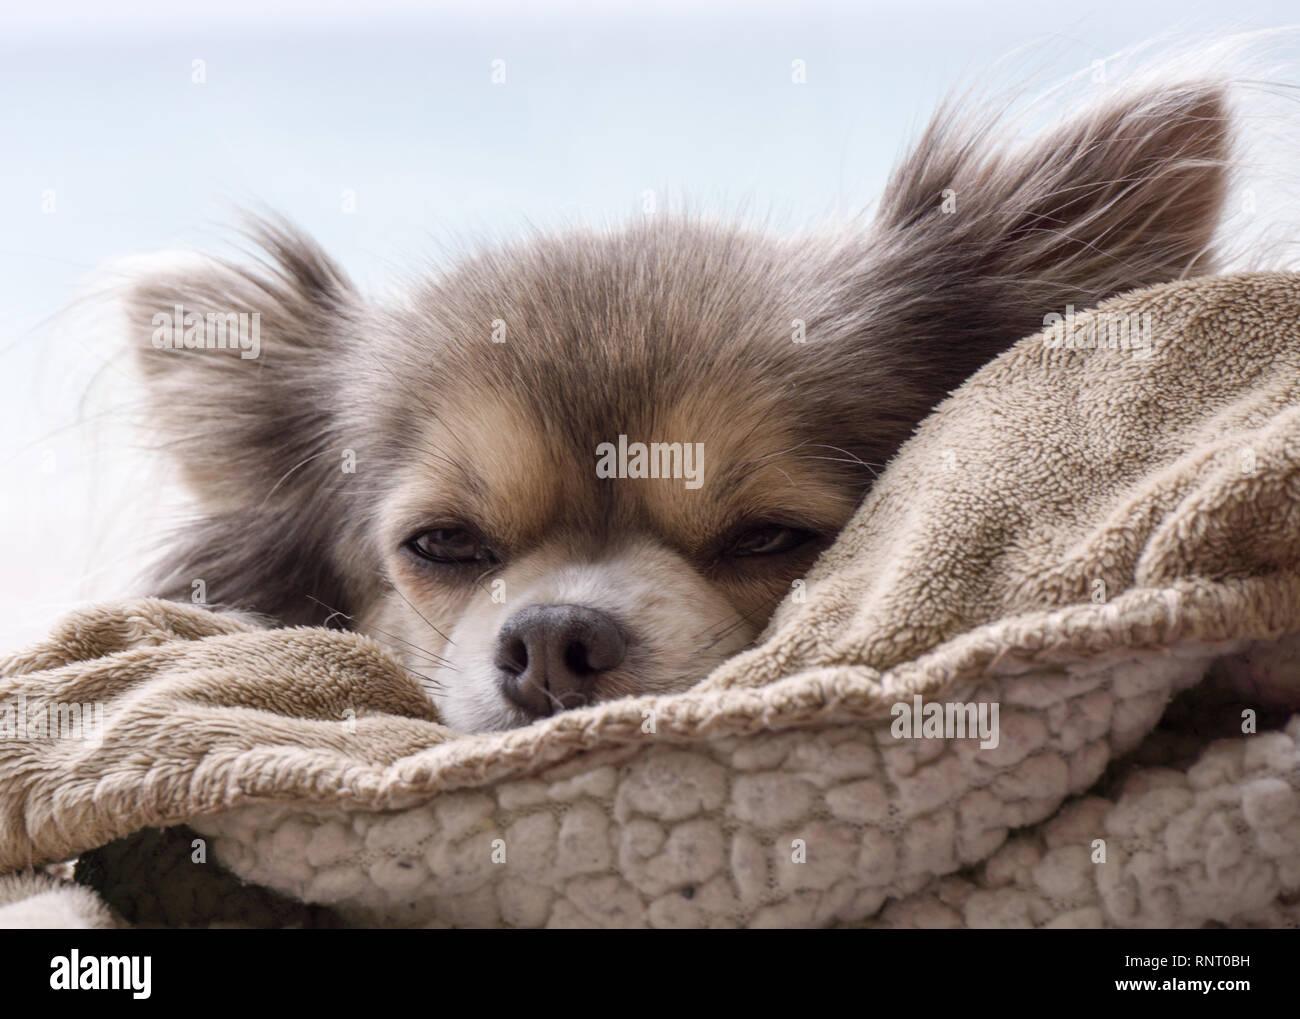 Beautiful snoozing long haired Chiwawa - Stock Image